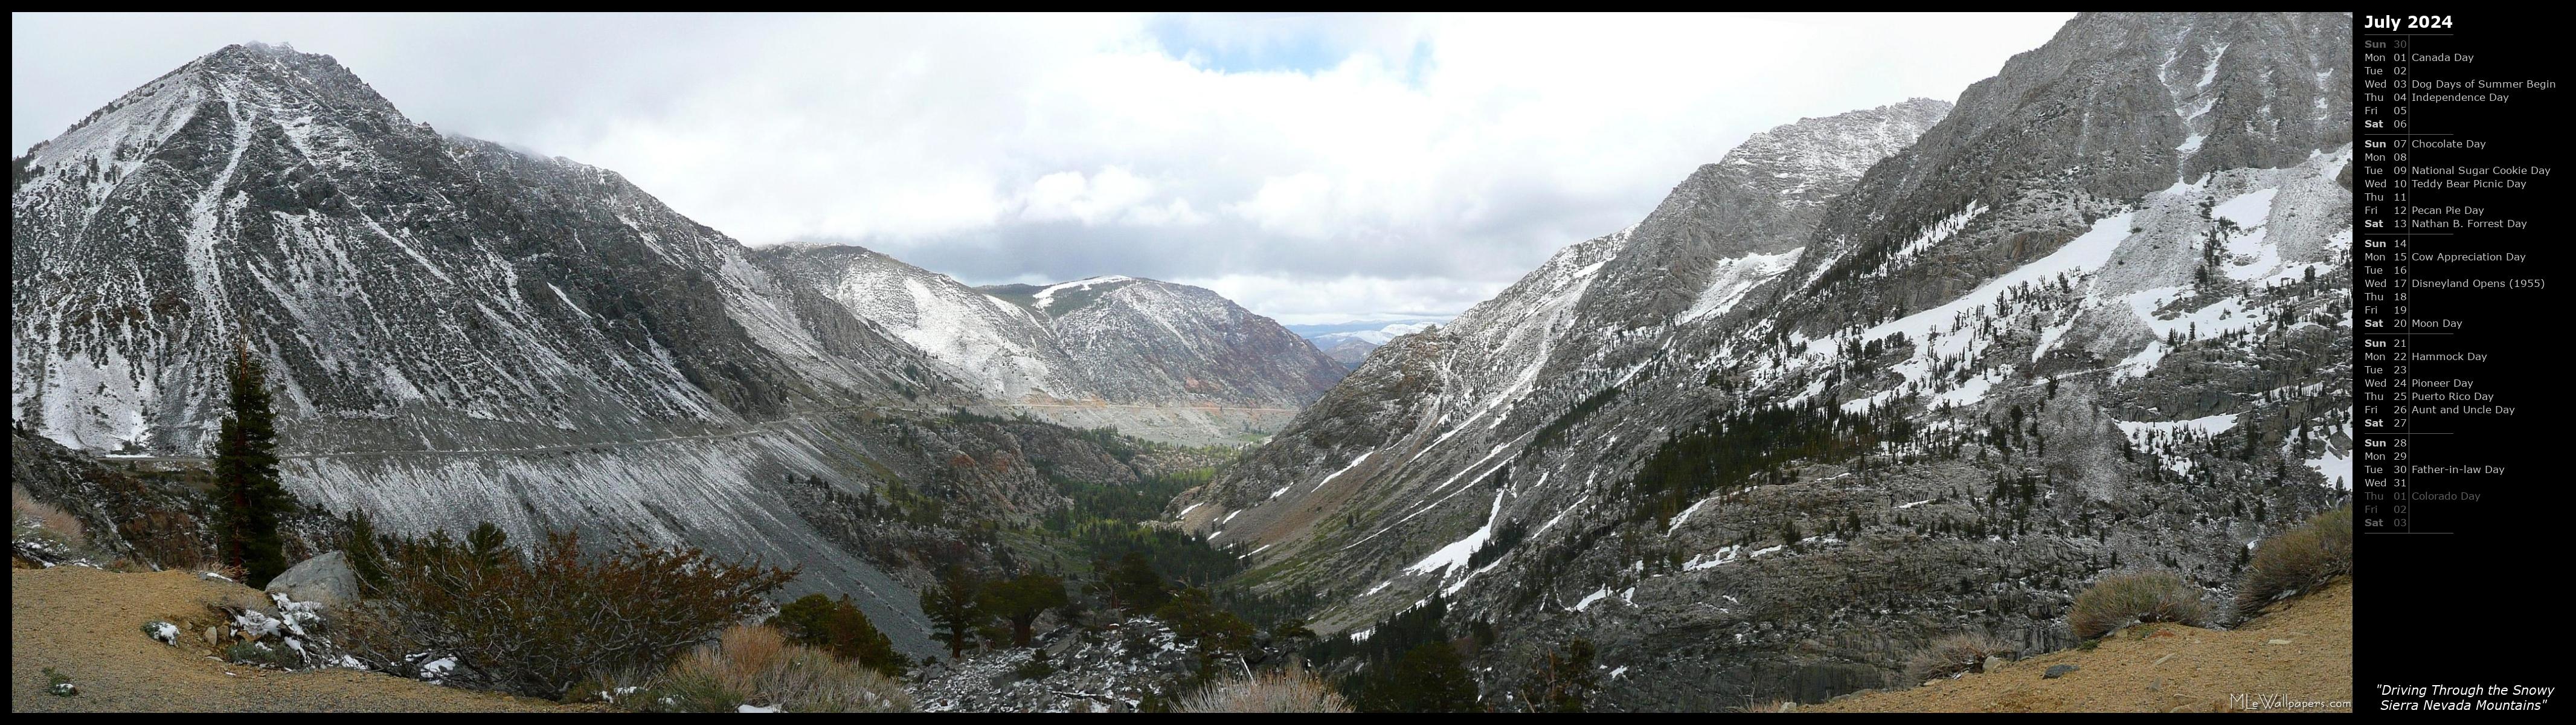 Mlewallpaperscom Driving Through The Snowy Sierra Nevada